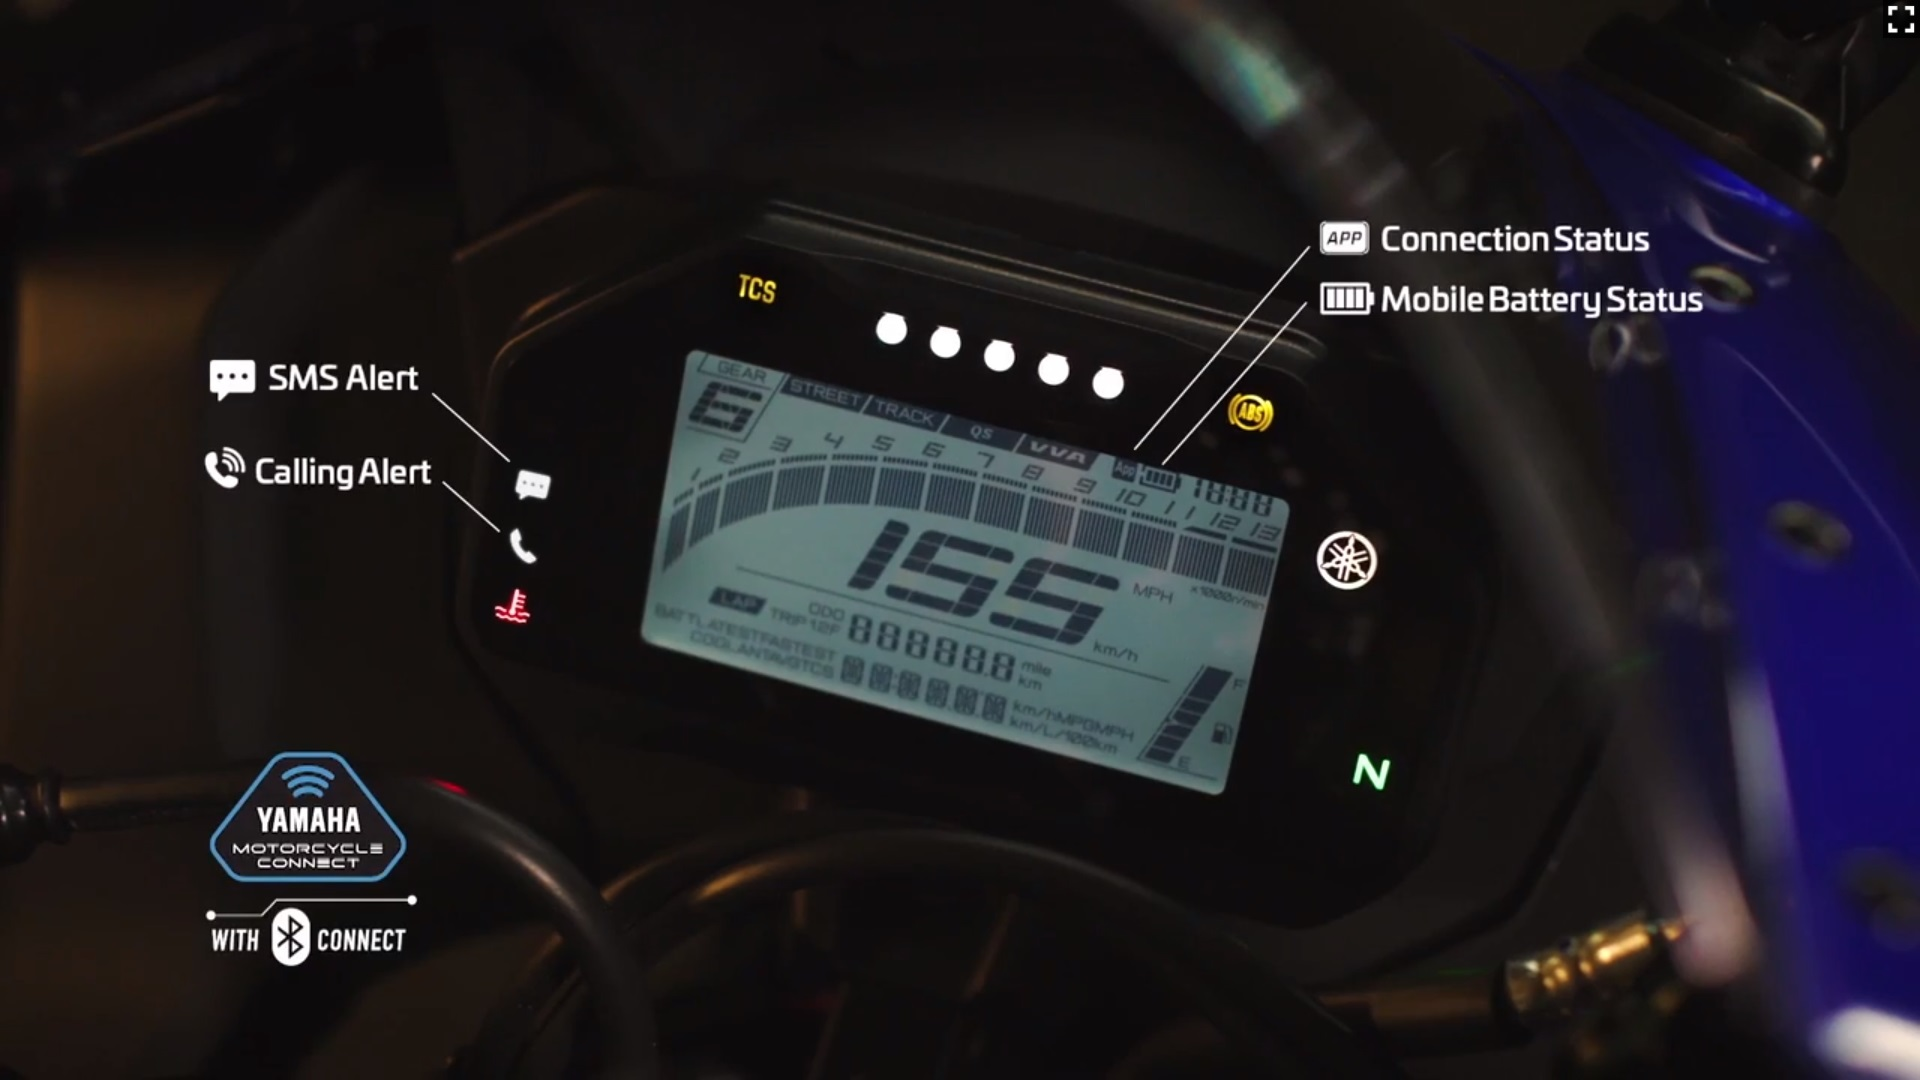 Yamaha R15 V4 digital meter